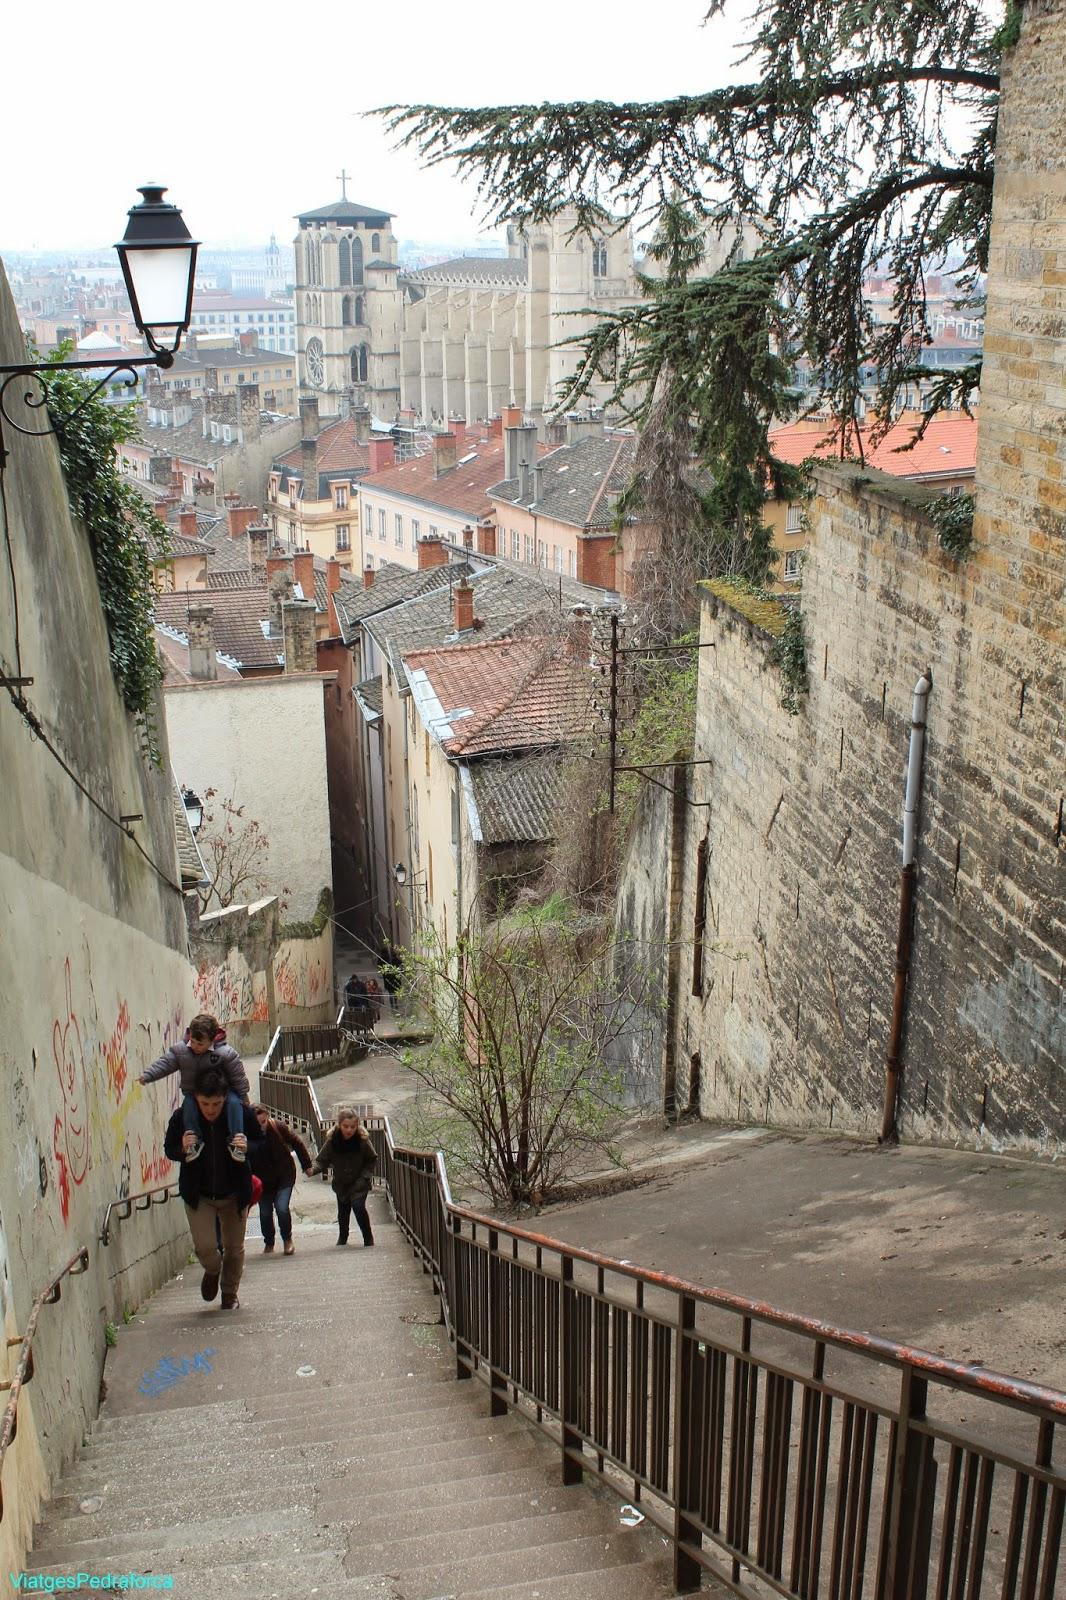 Vieux Lyon, Catedral gotica Saint Jean Baptiste, Lió, Rhône-Alpes, França, France, Unesco World Heritatge, Patrimoni de la Humanitat